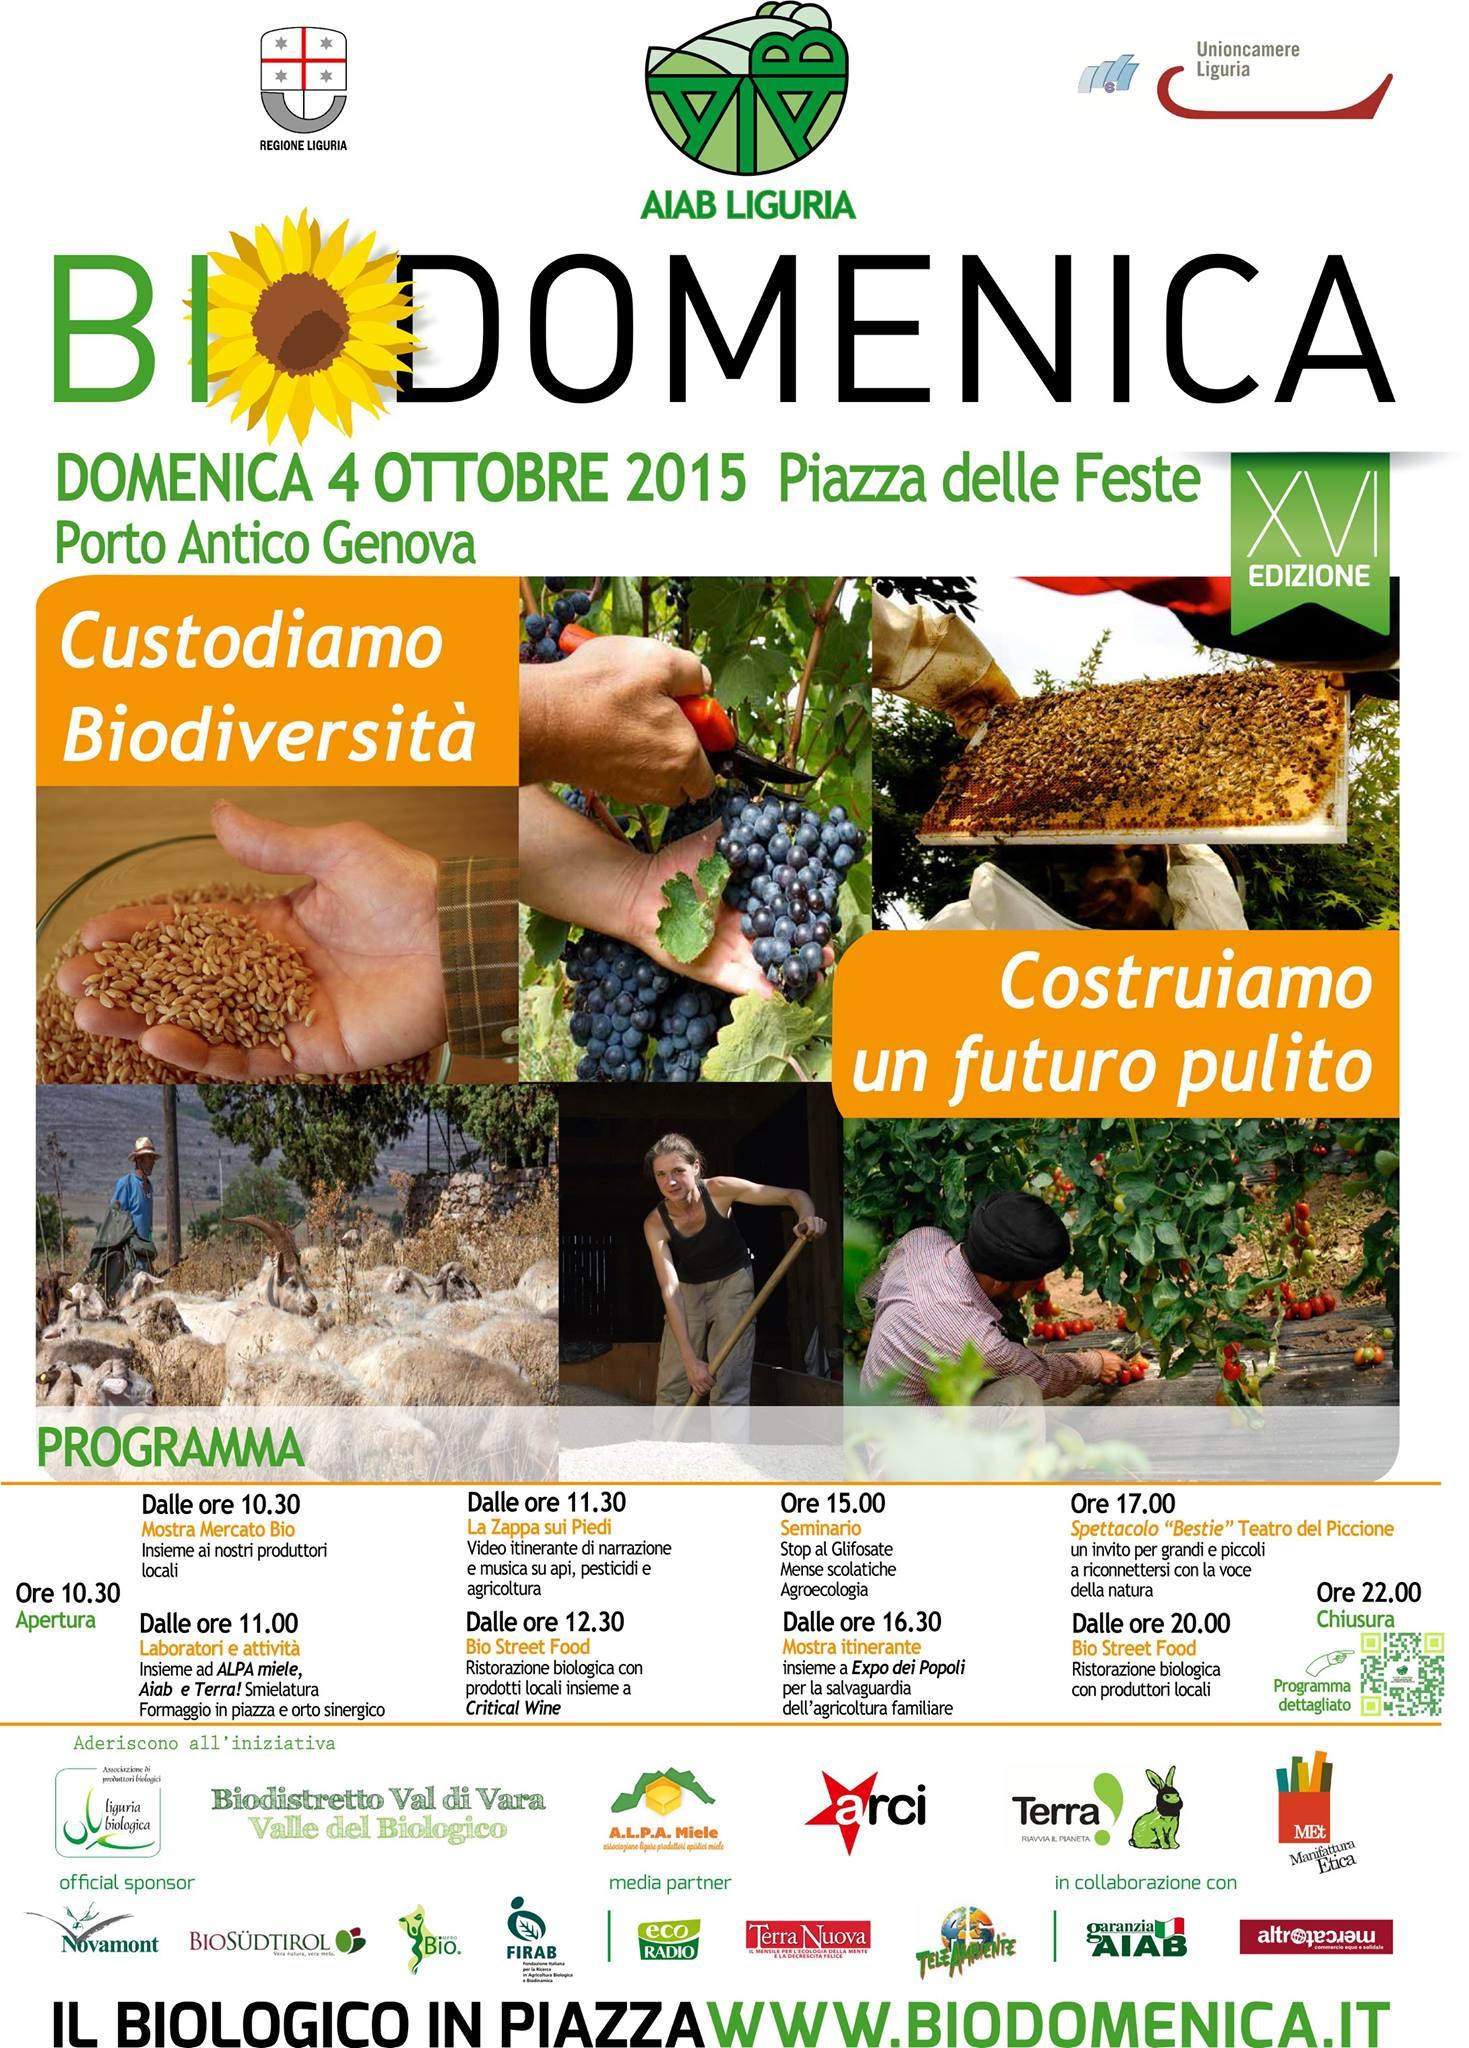 locandina Biodomenica 2015